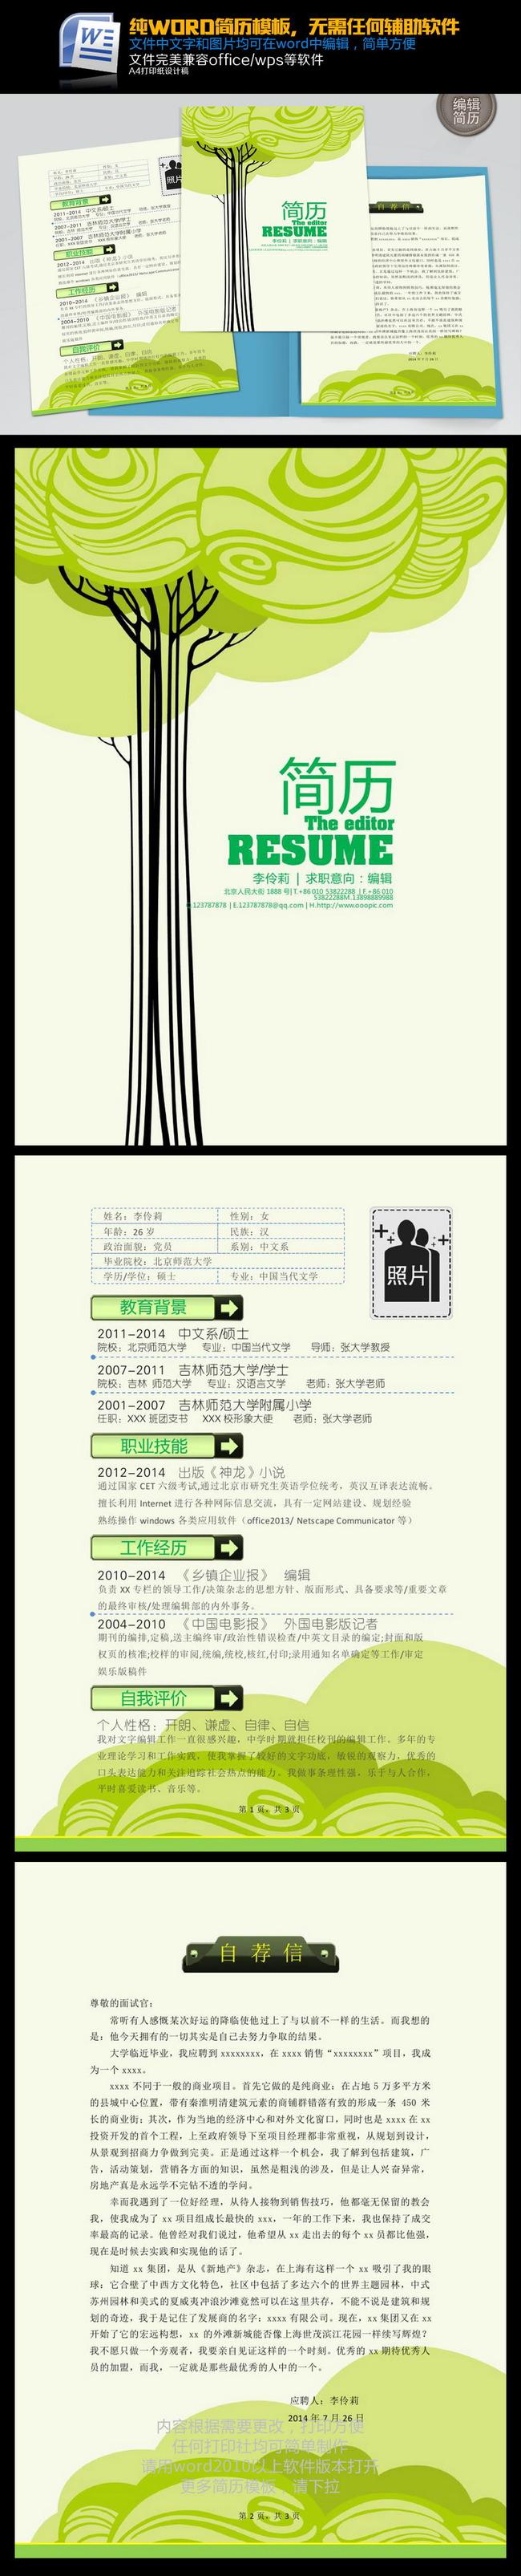 word幼师女生秘书翻译树简历模板下载图片